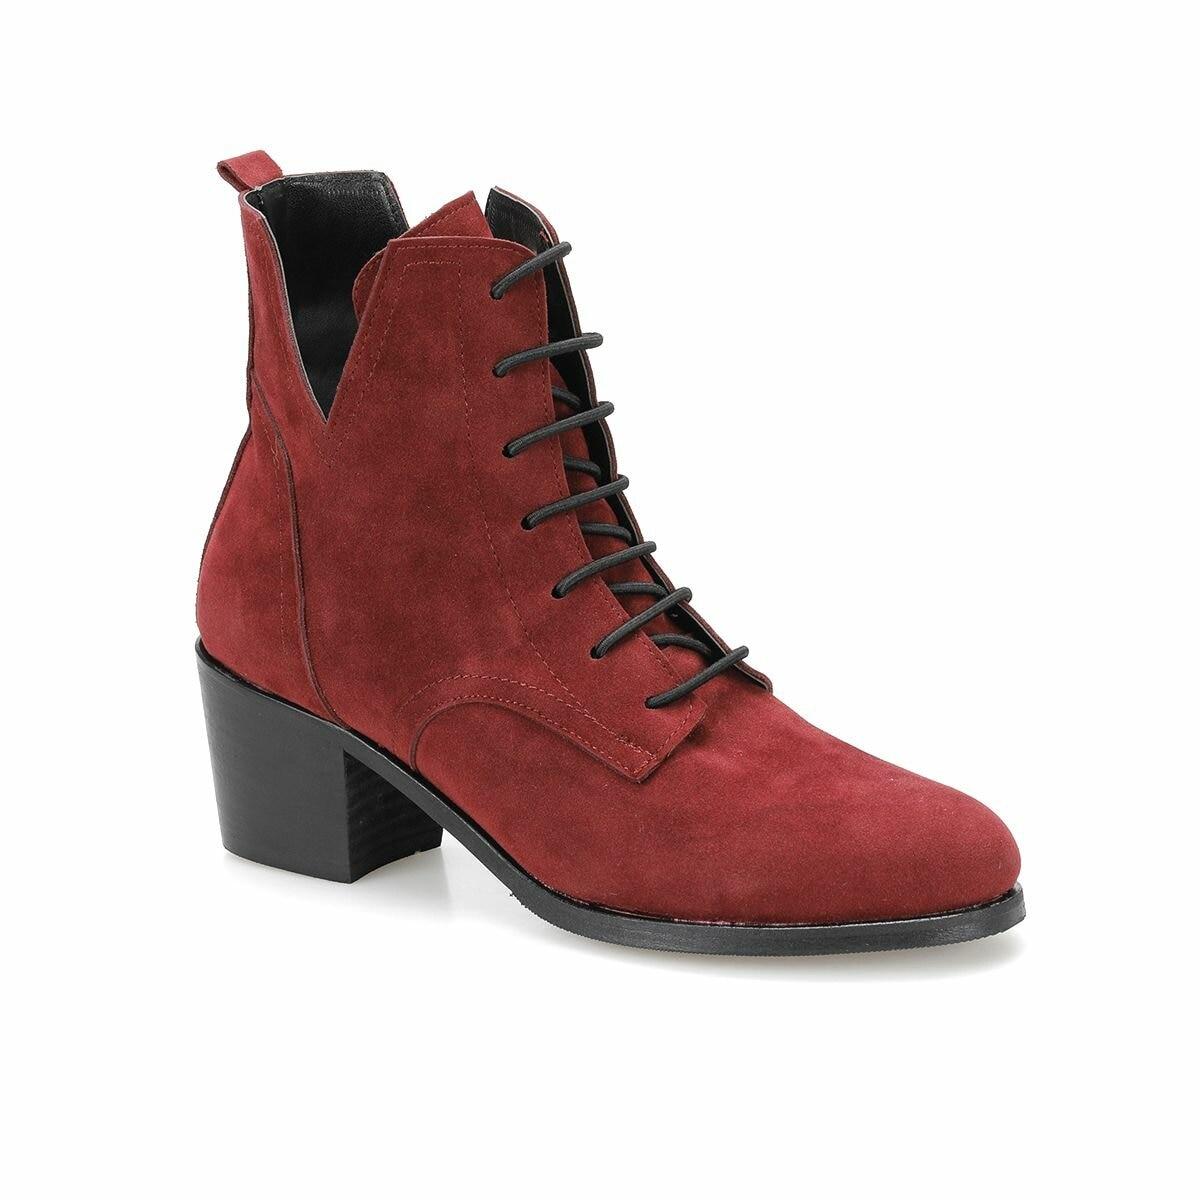 FLO OSGOOD31Z SKIN Maroon Women 'S Boots BUTIGO